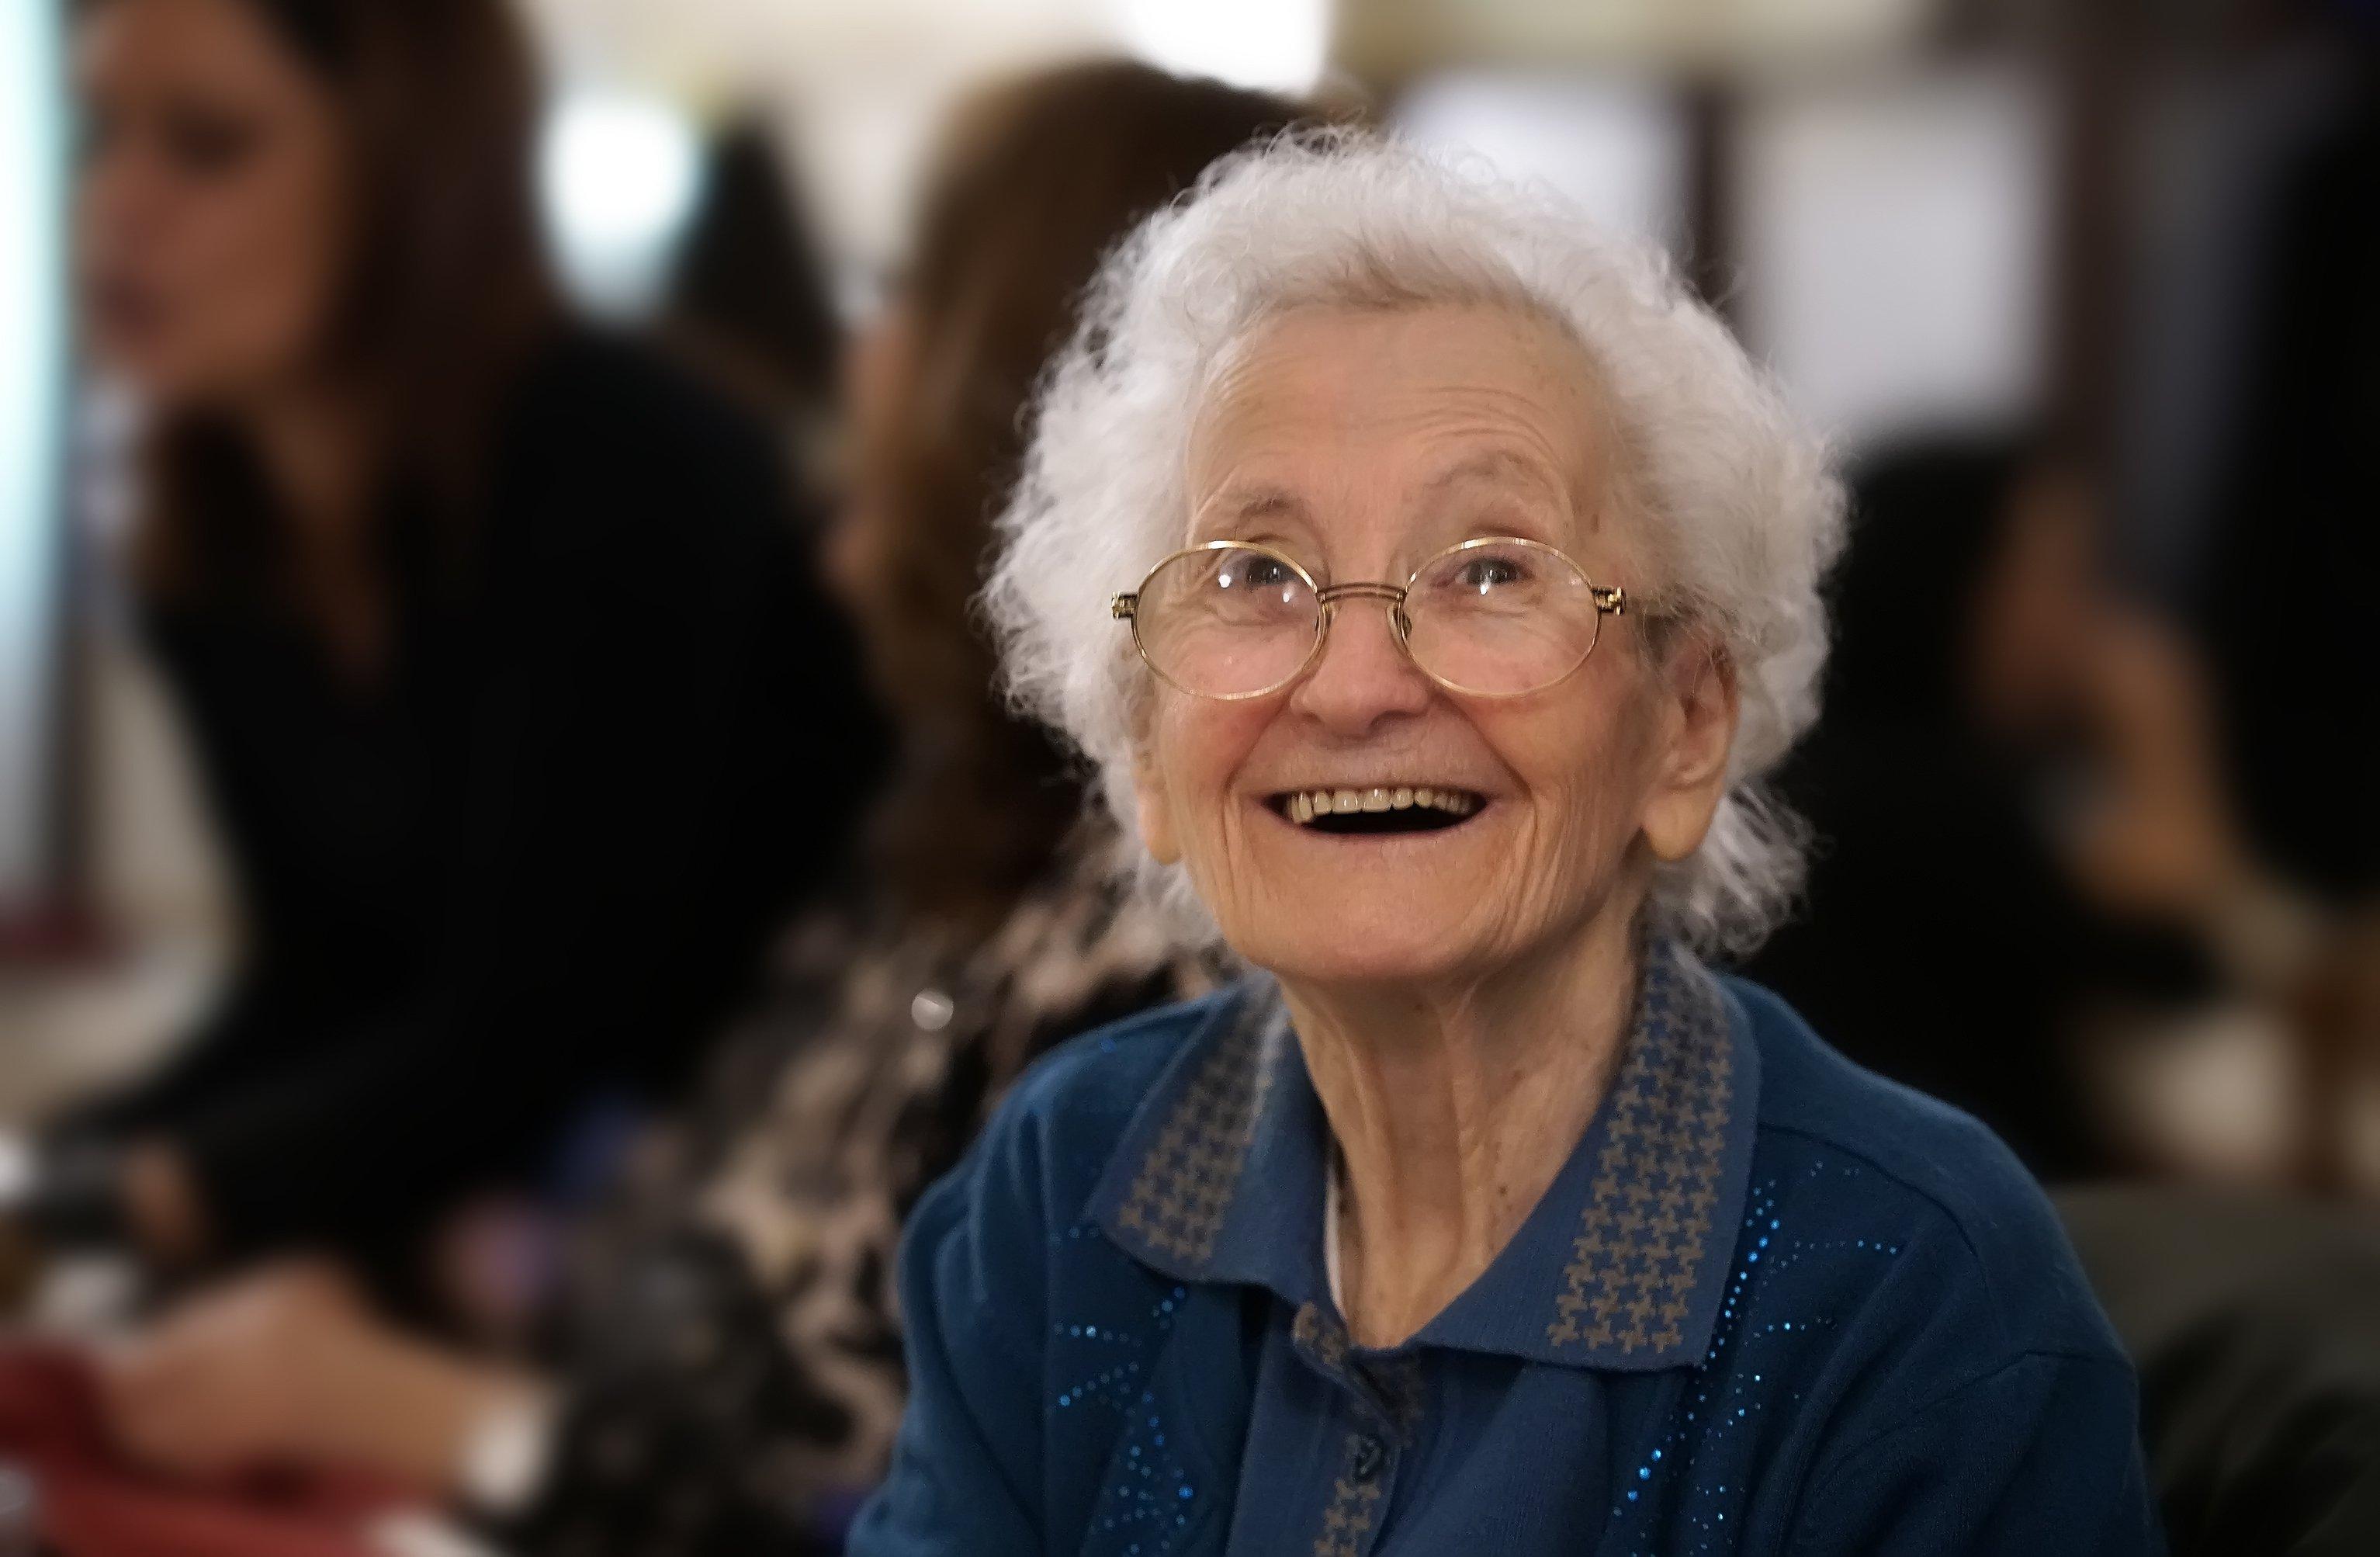 Une femme âgée | Photo : Shutterstock